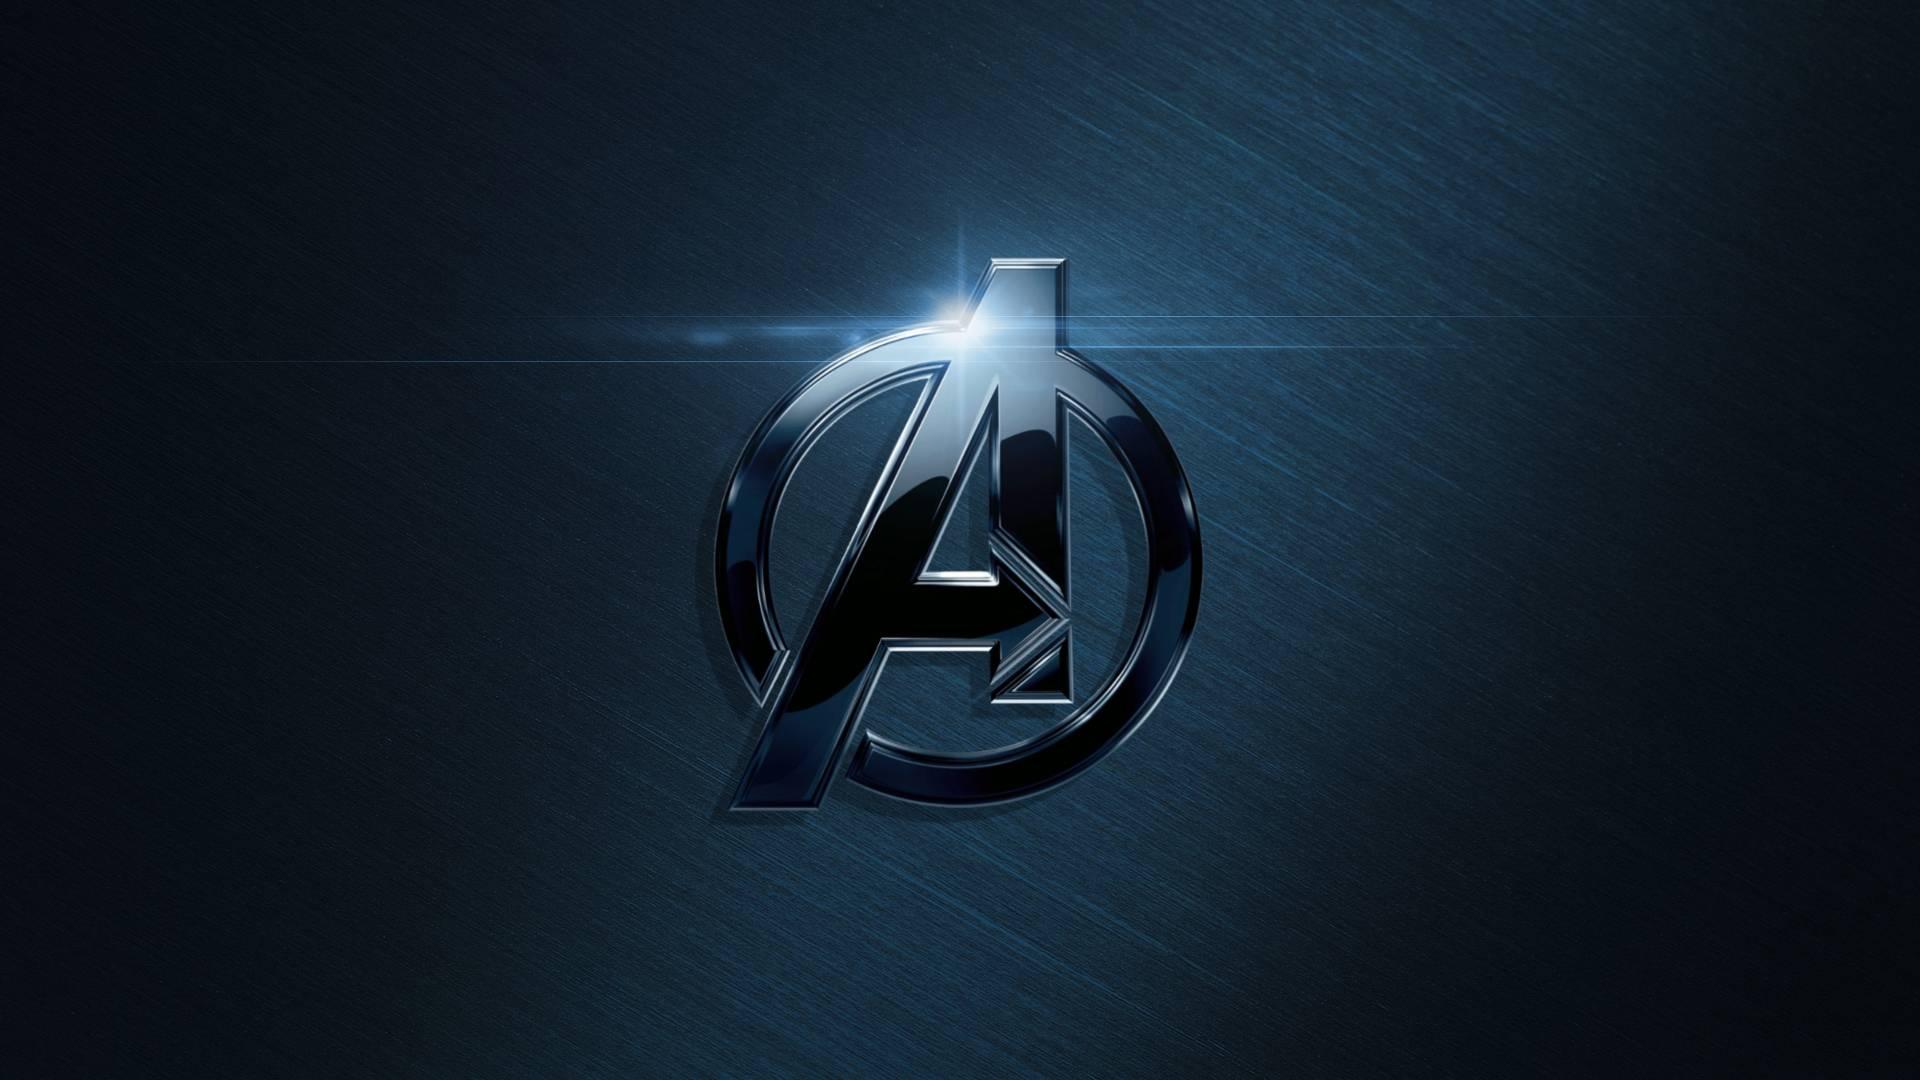 Avengers desktop wallpapers wallpaper cave - Steamgirl download ...